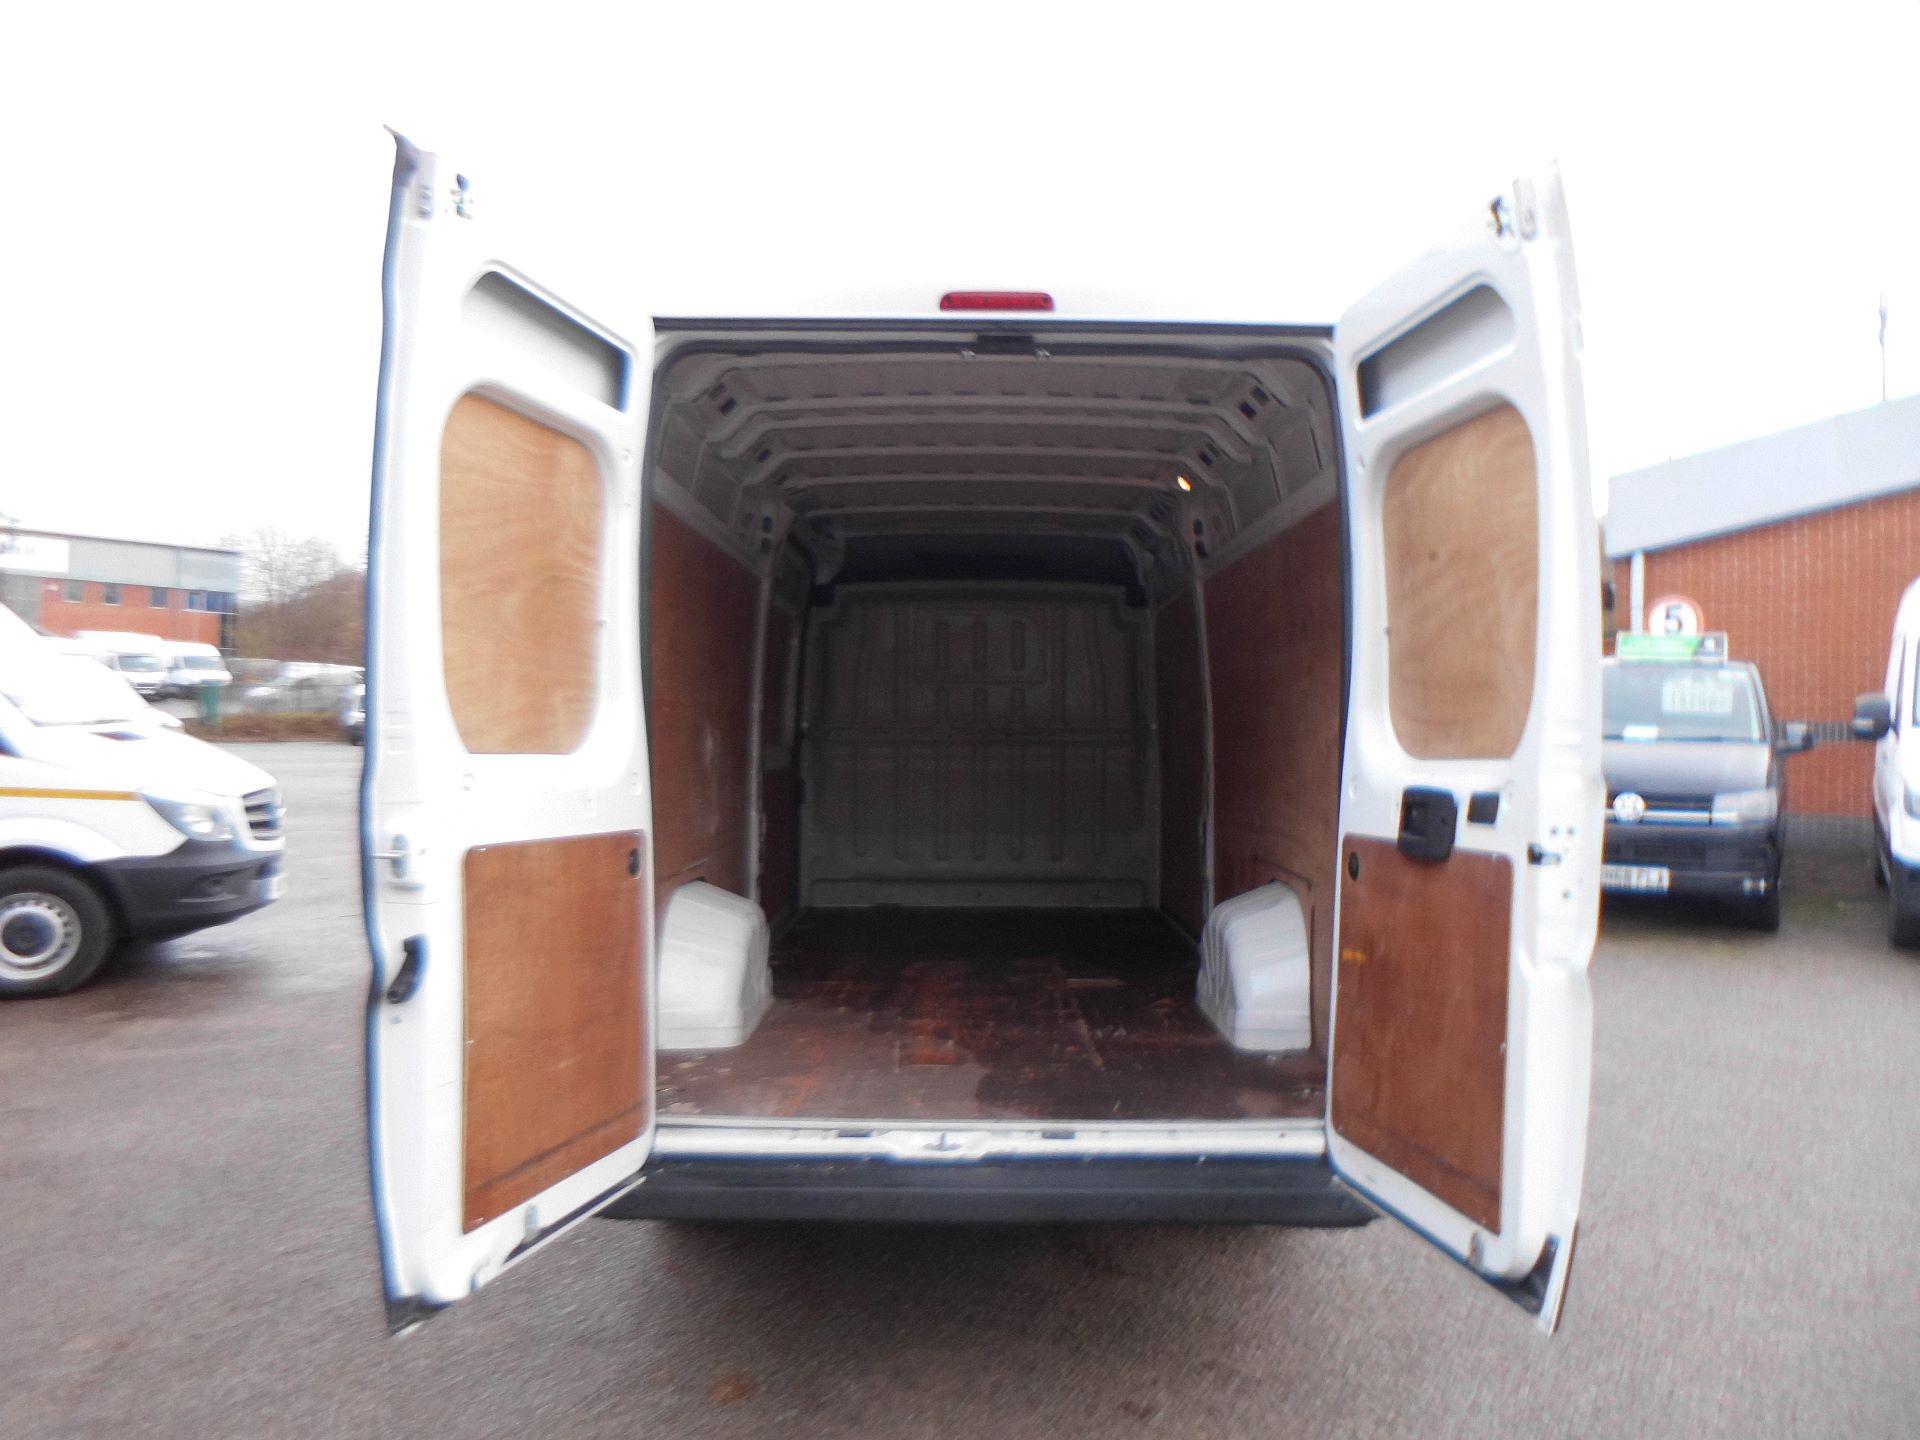 2018 Peugeot Boxer 435 2.0 Bluehdi L4 H2 Professional Van 130Ps (OU18ODV) Image 10